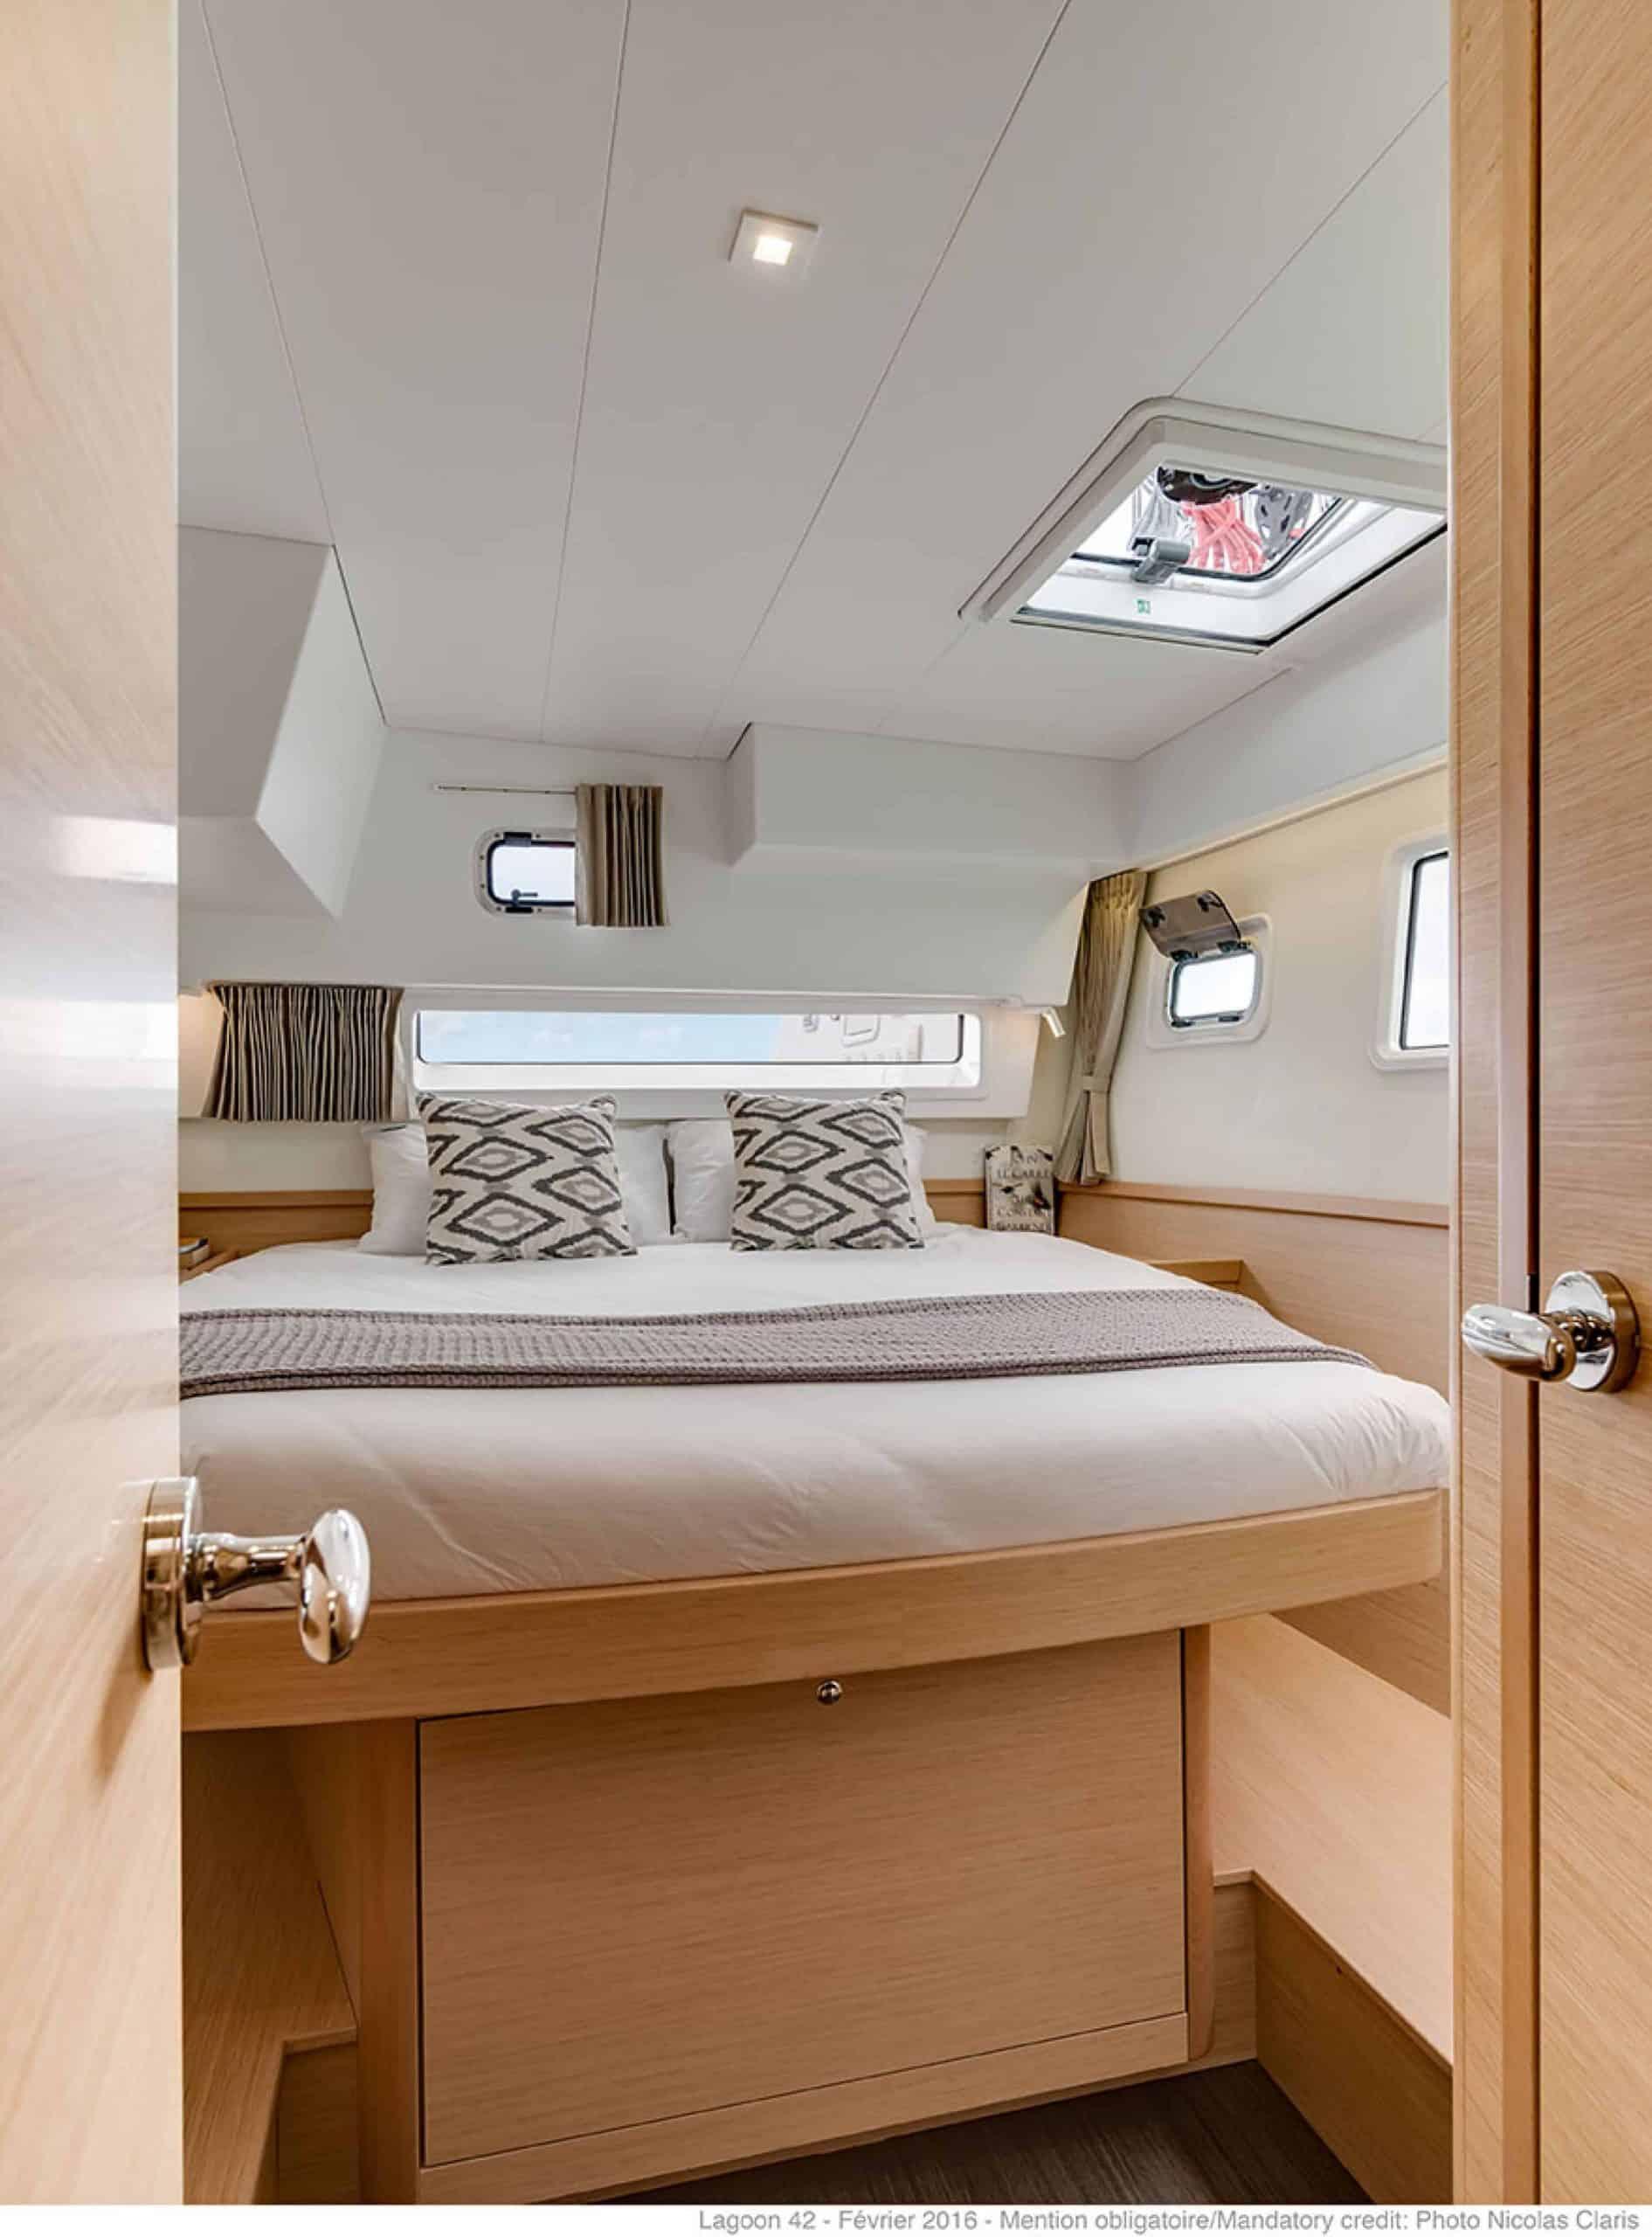 Cabin interior design with massive double bed